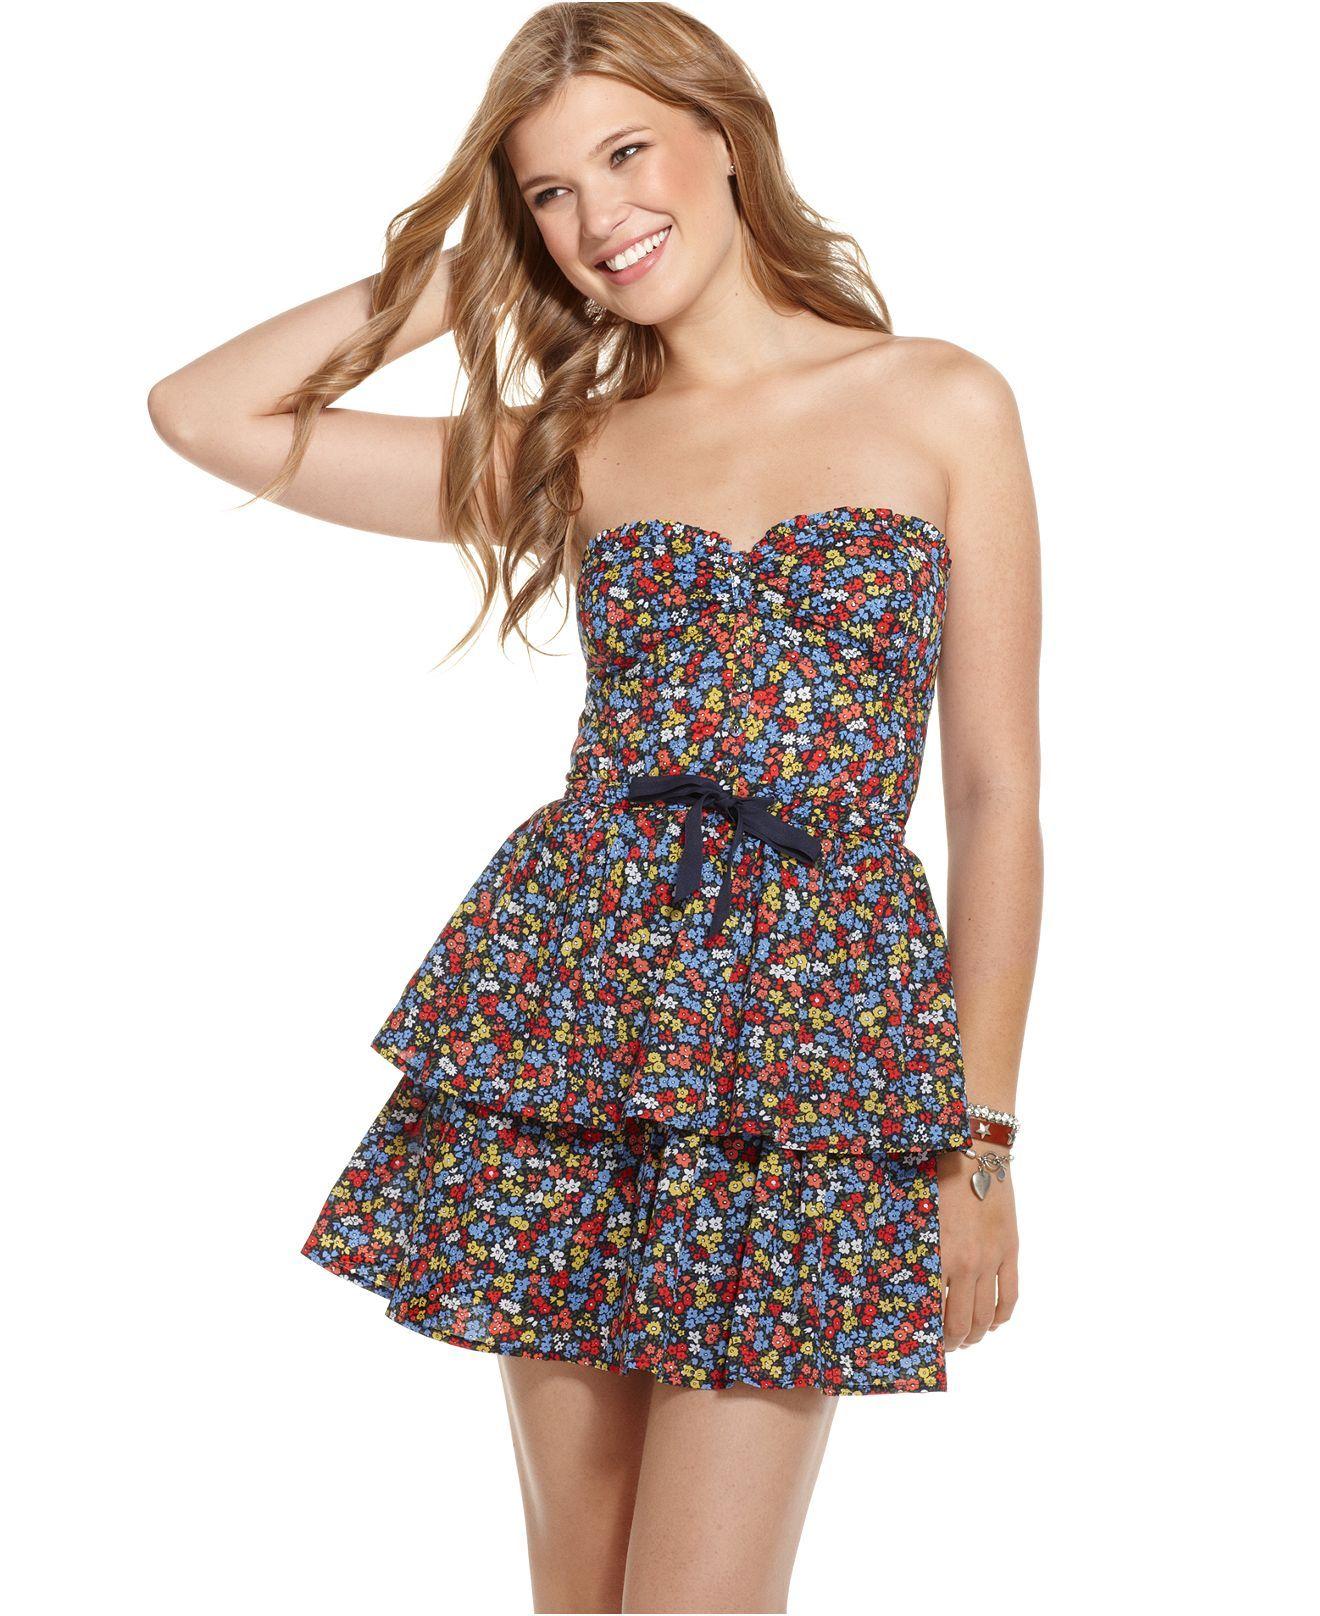 1de3d8ca4b53f5 Tommy Girl soo cute!!!!   My Style   Summer dresses, Girls dresses ...